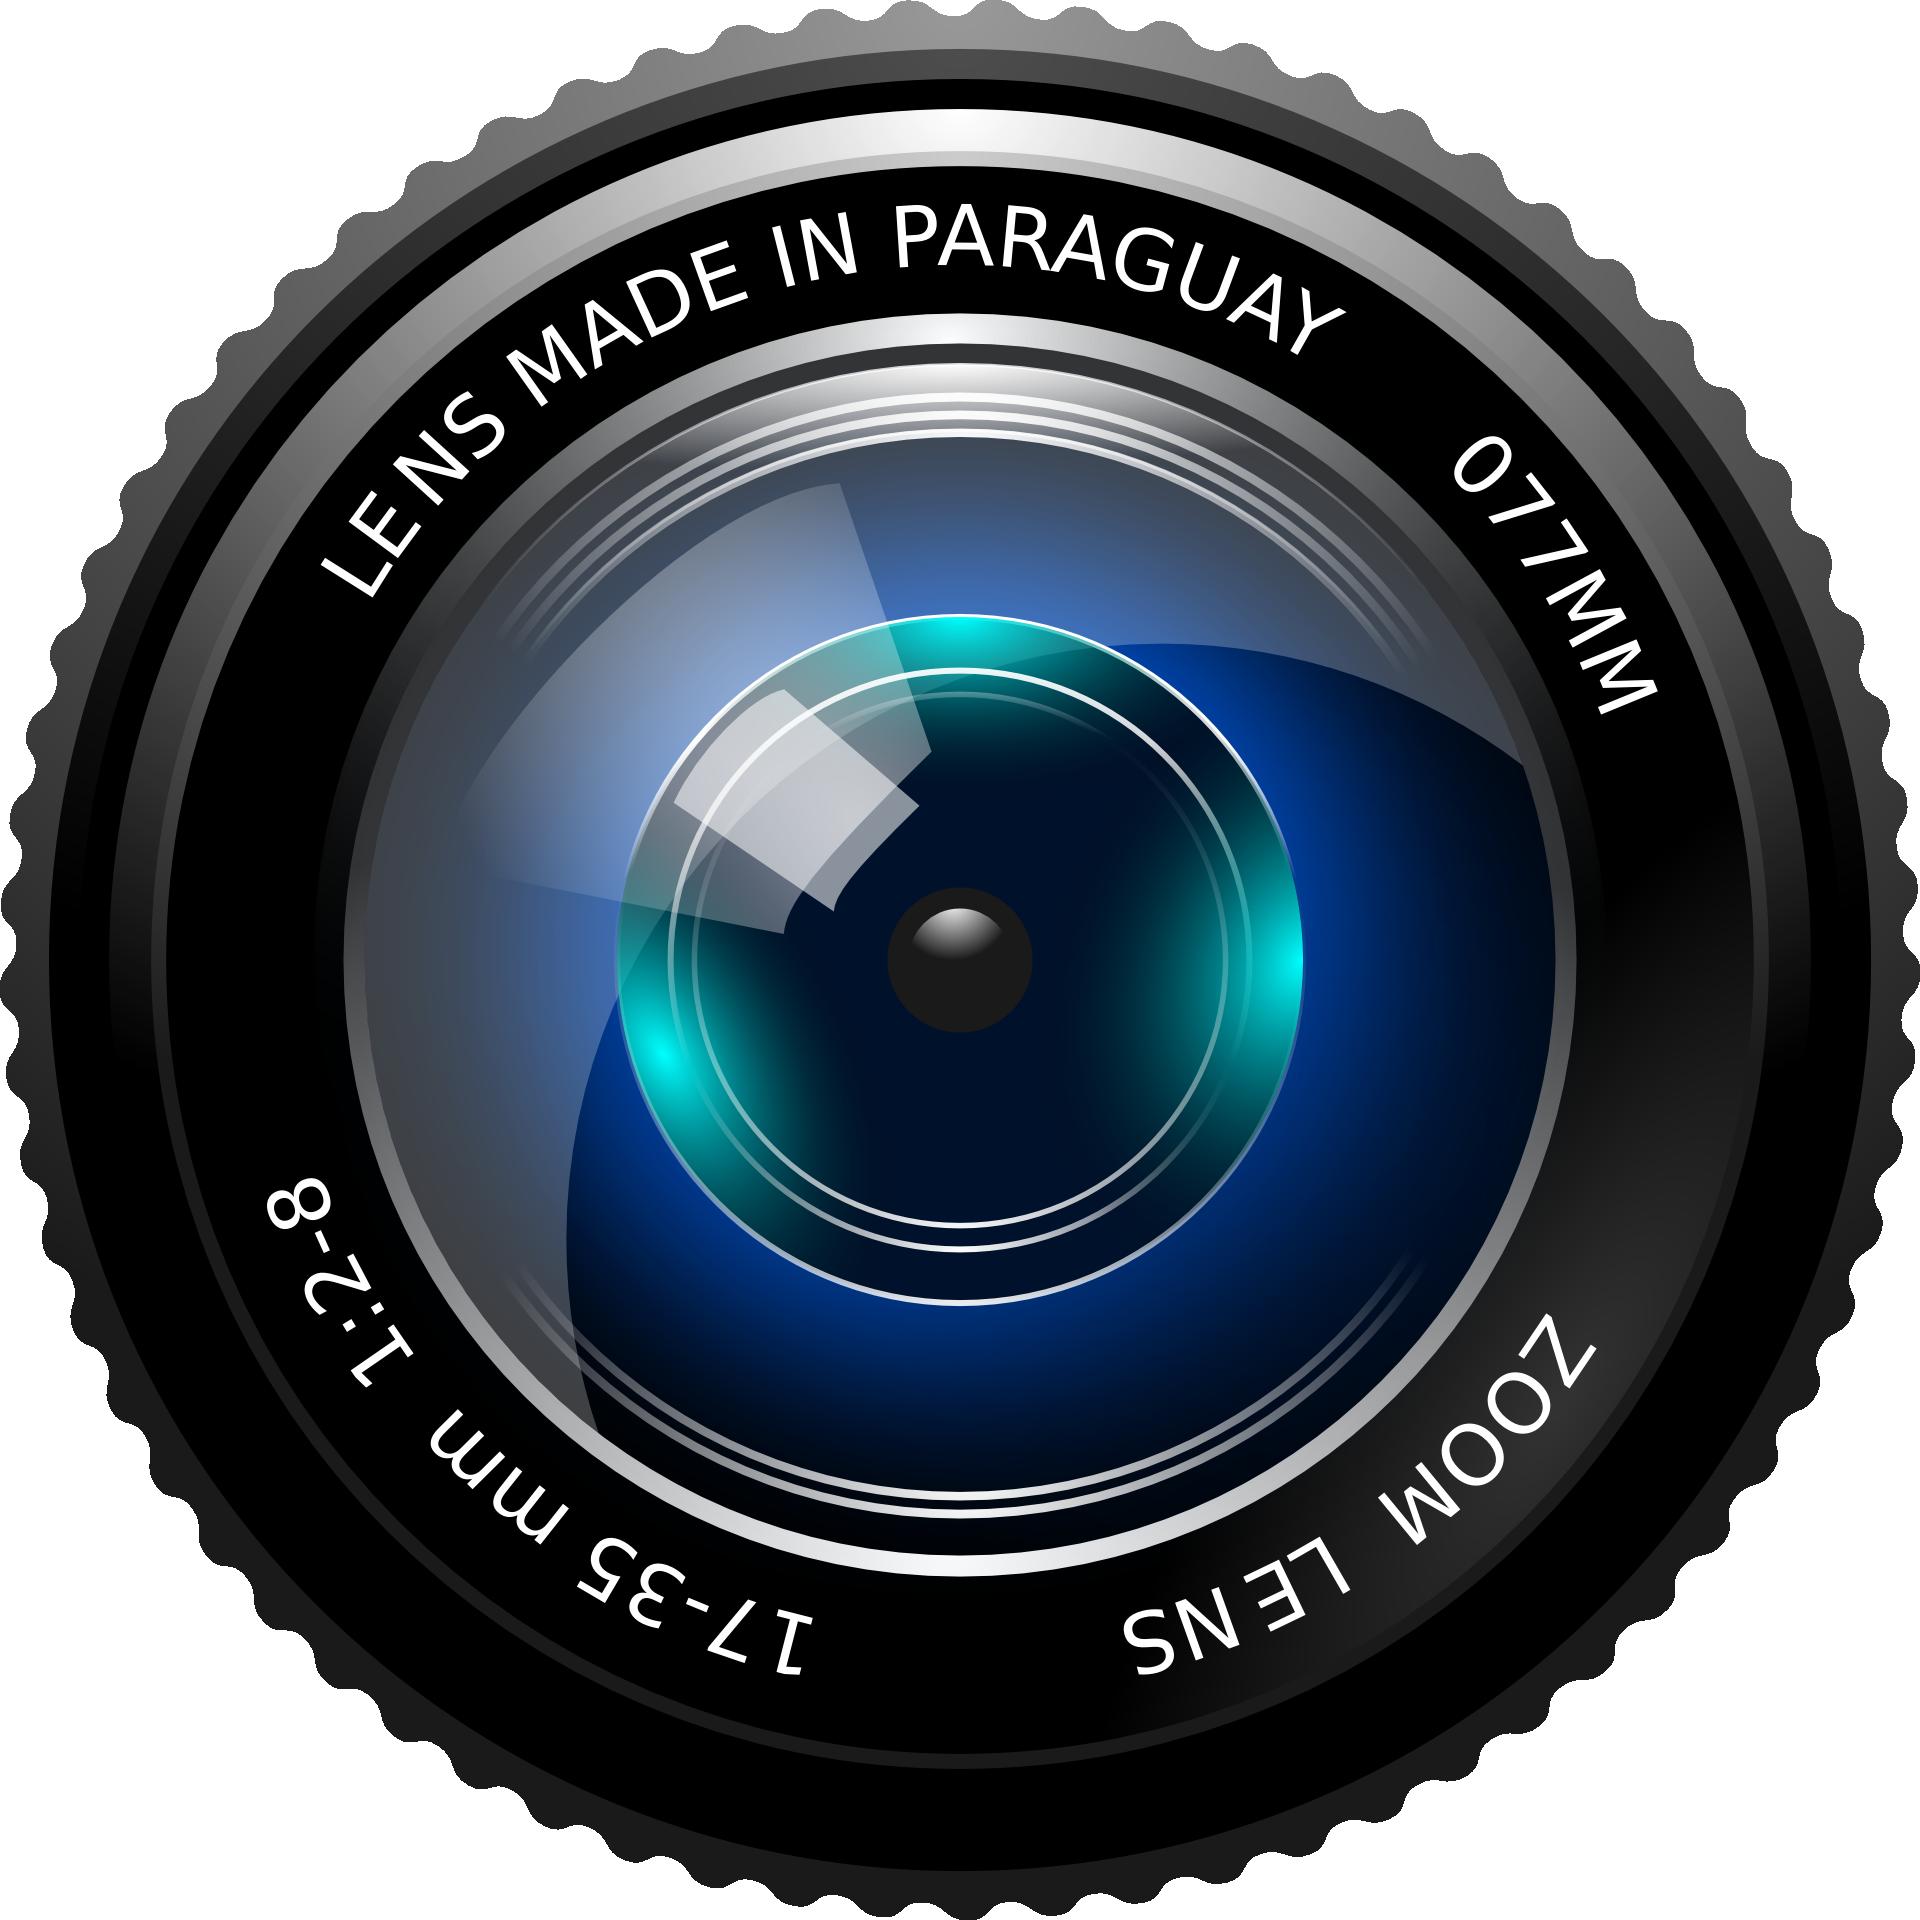 Download Camera Lens PNG Image.